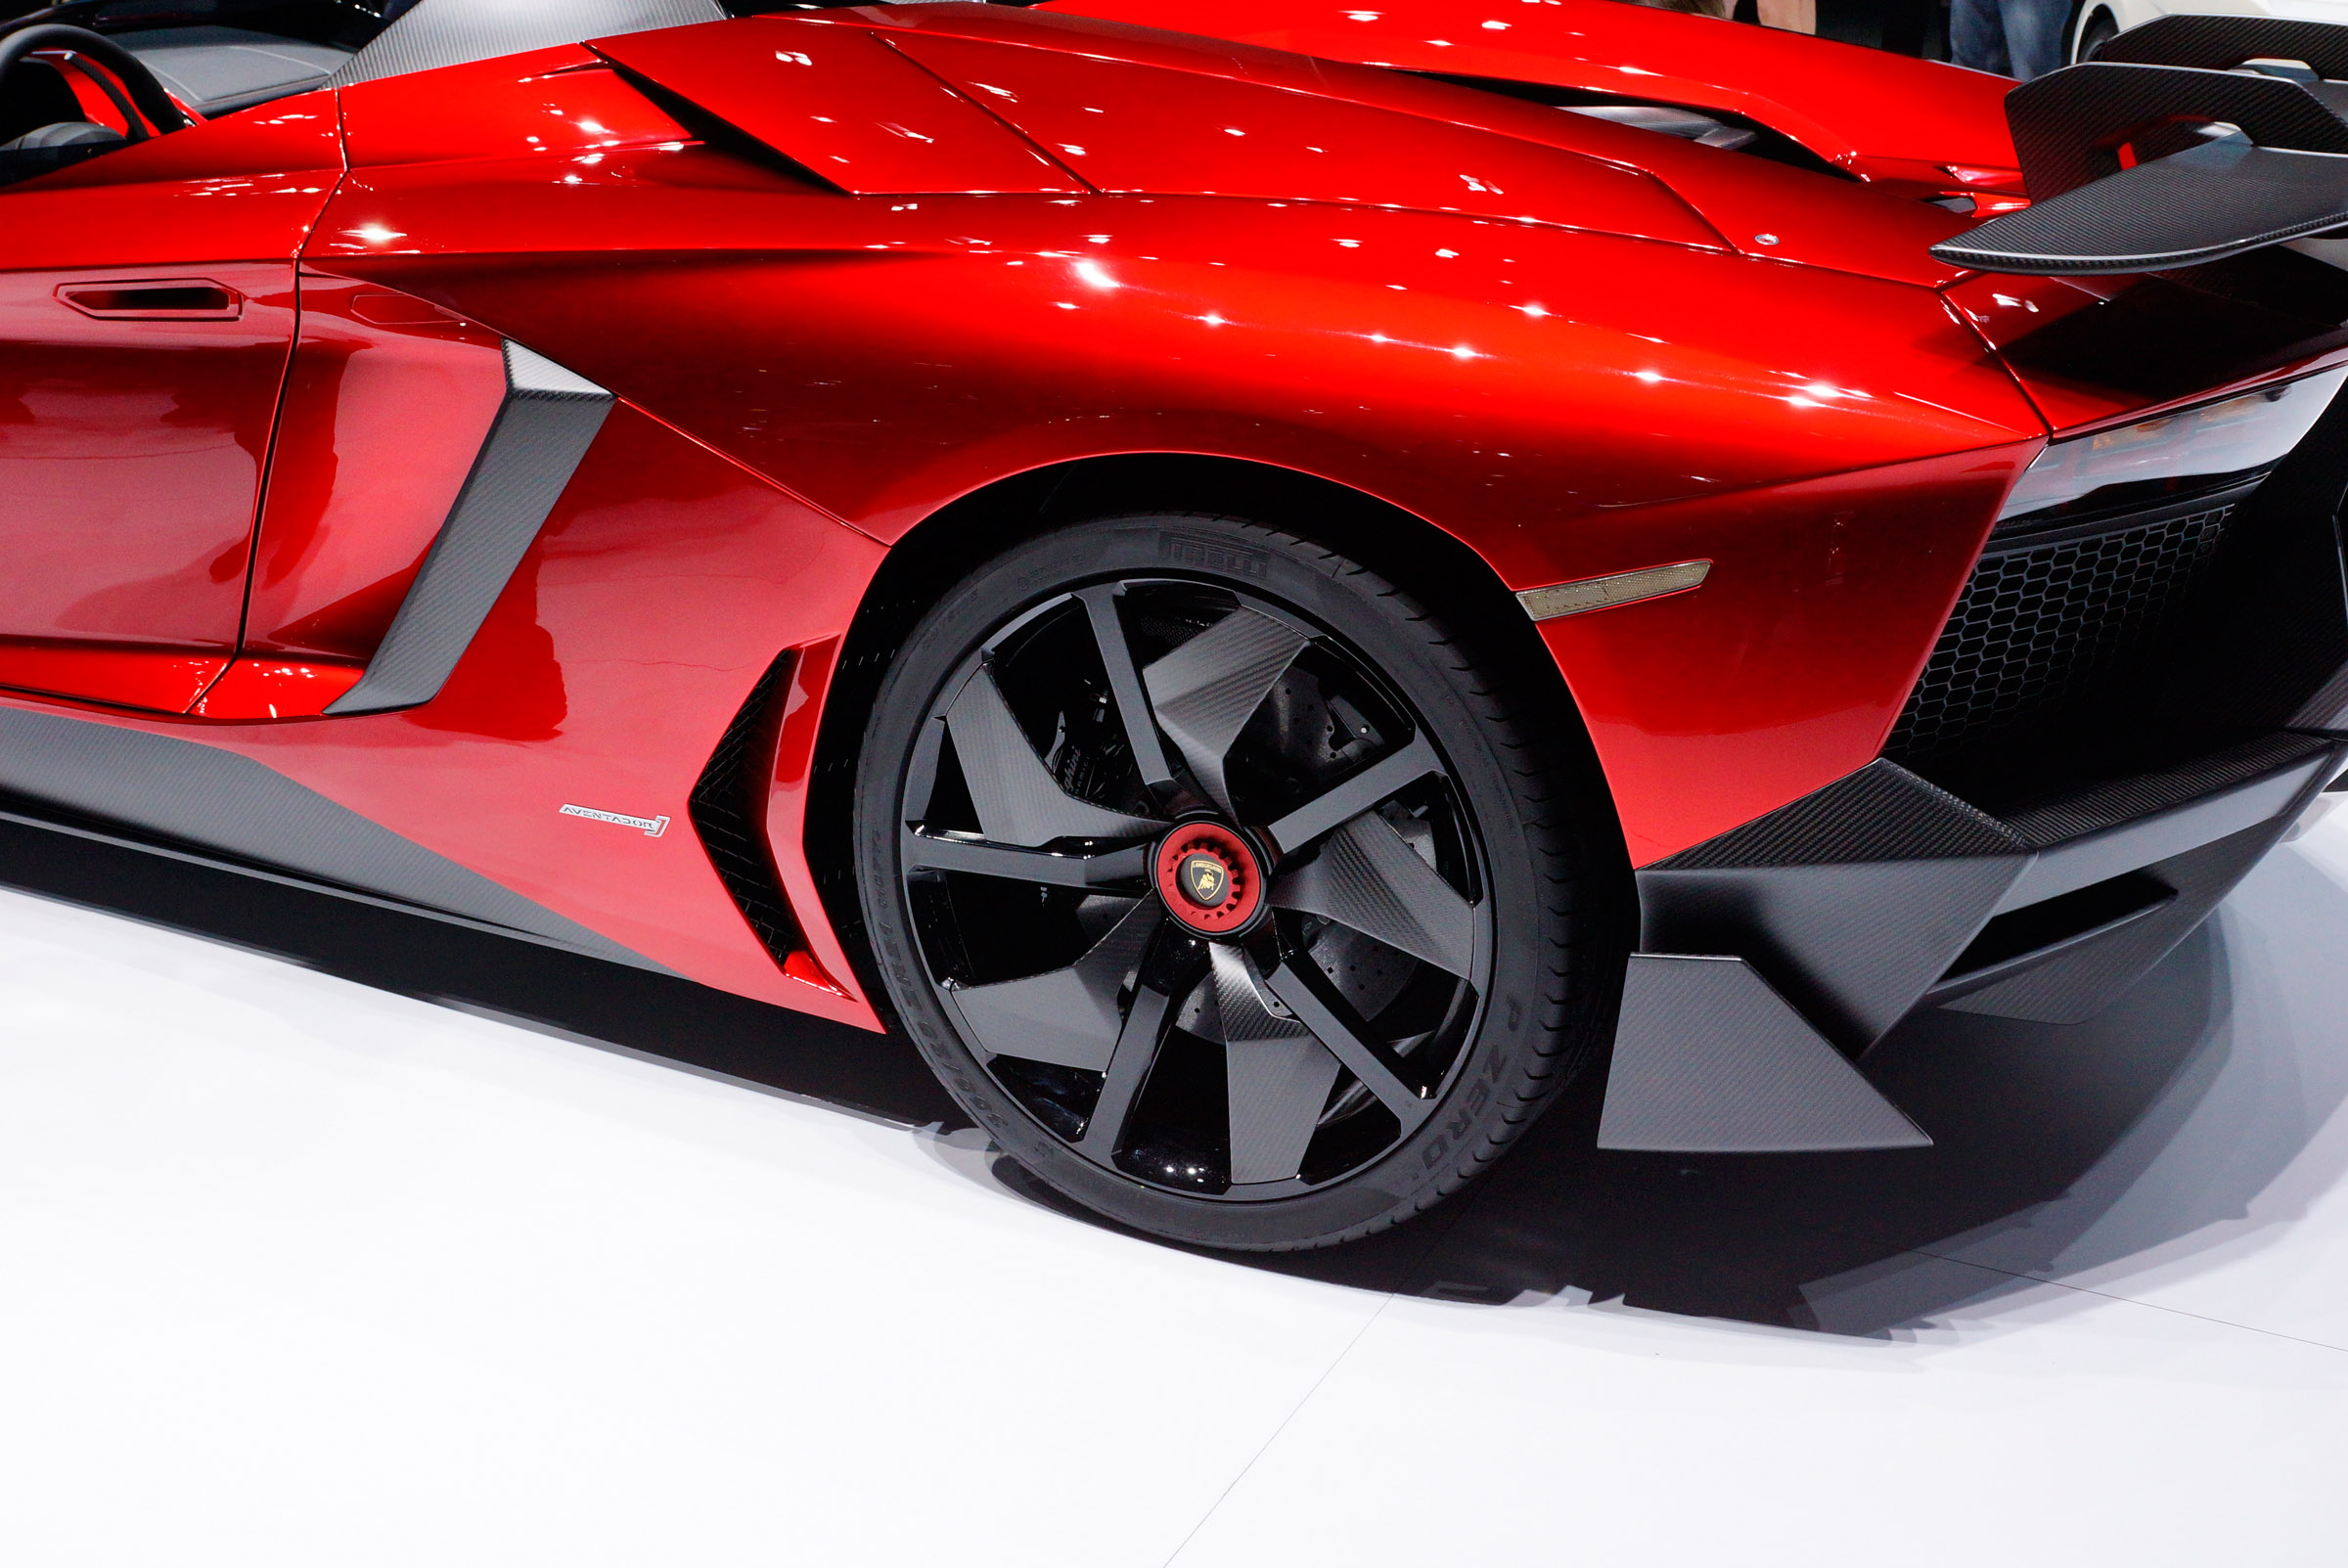 2012 Geneva Motor Show: Lamborghini Aventador J - фотография №1